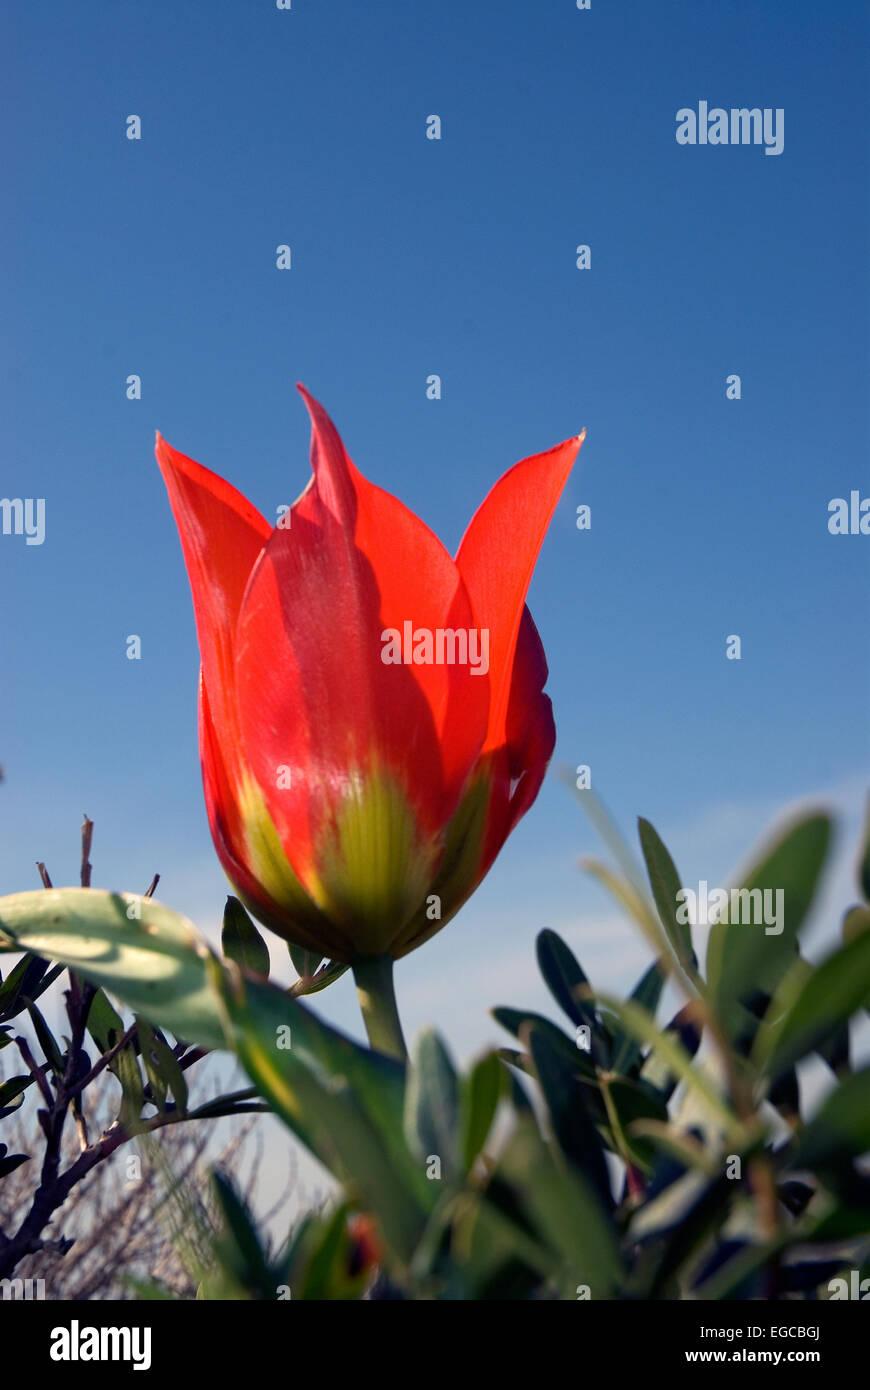 Tulipa agenensis - Stock Image